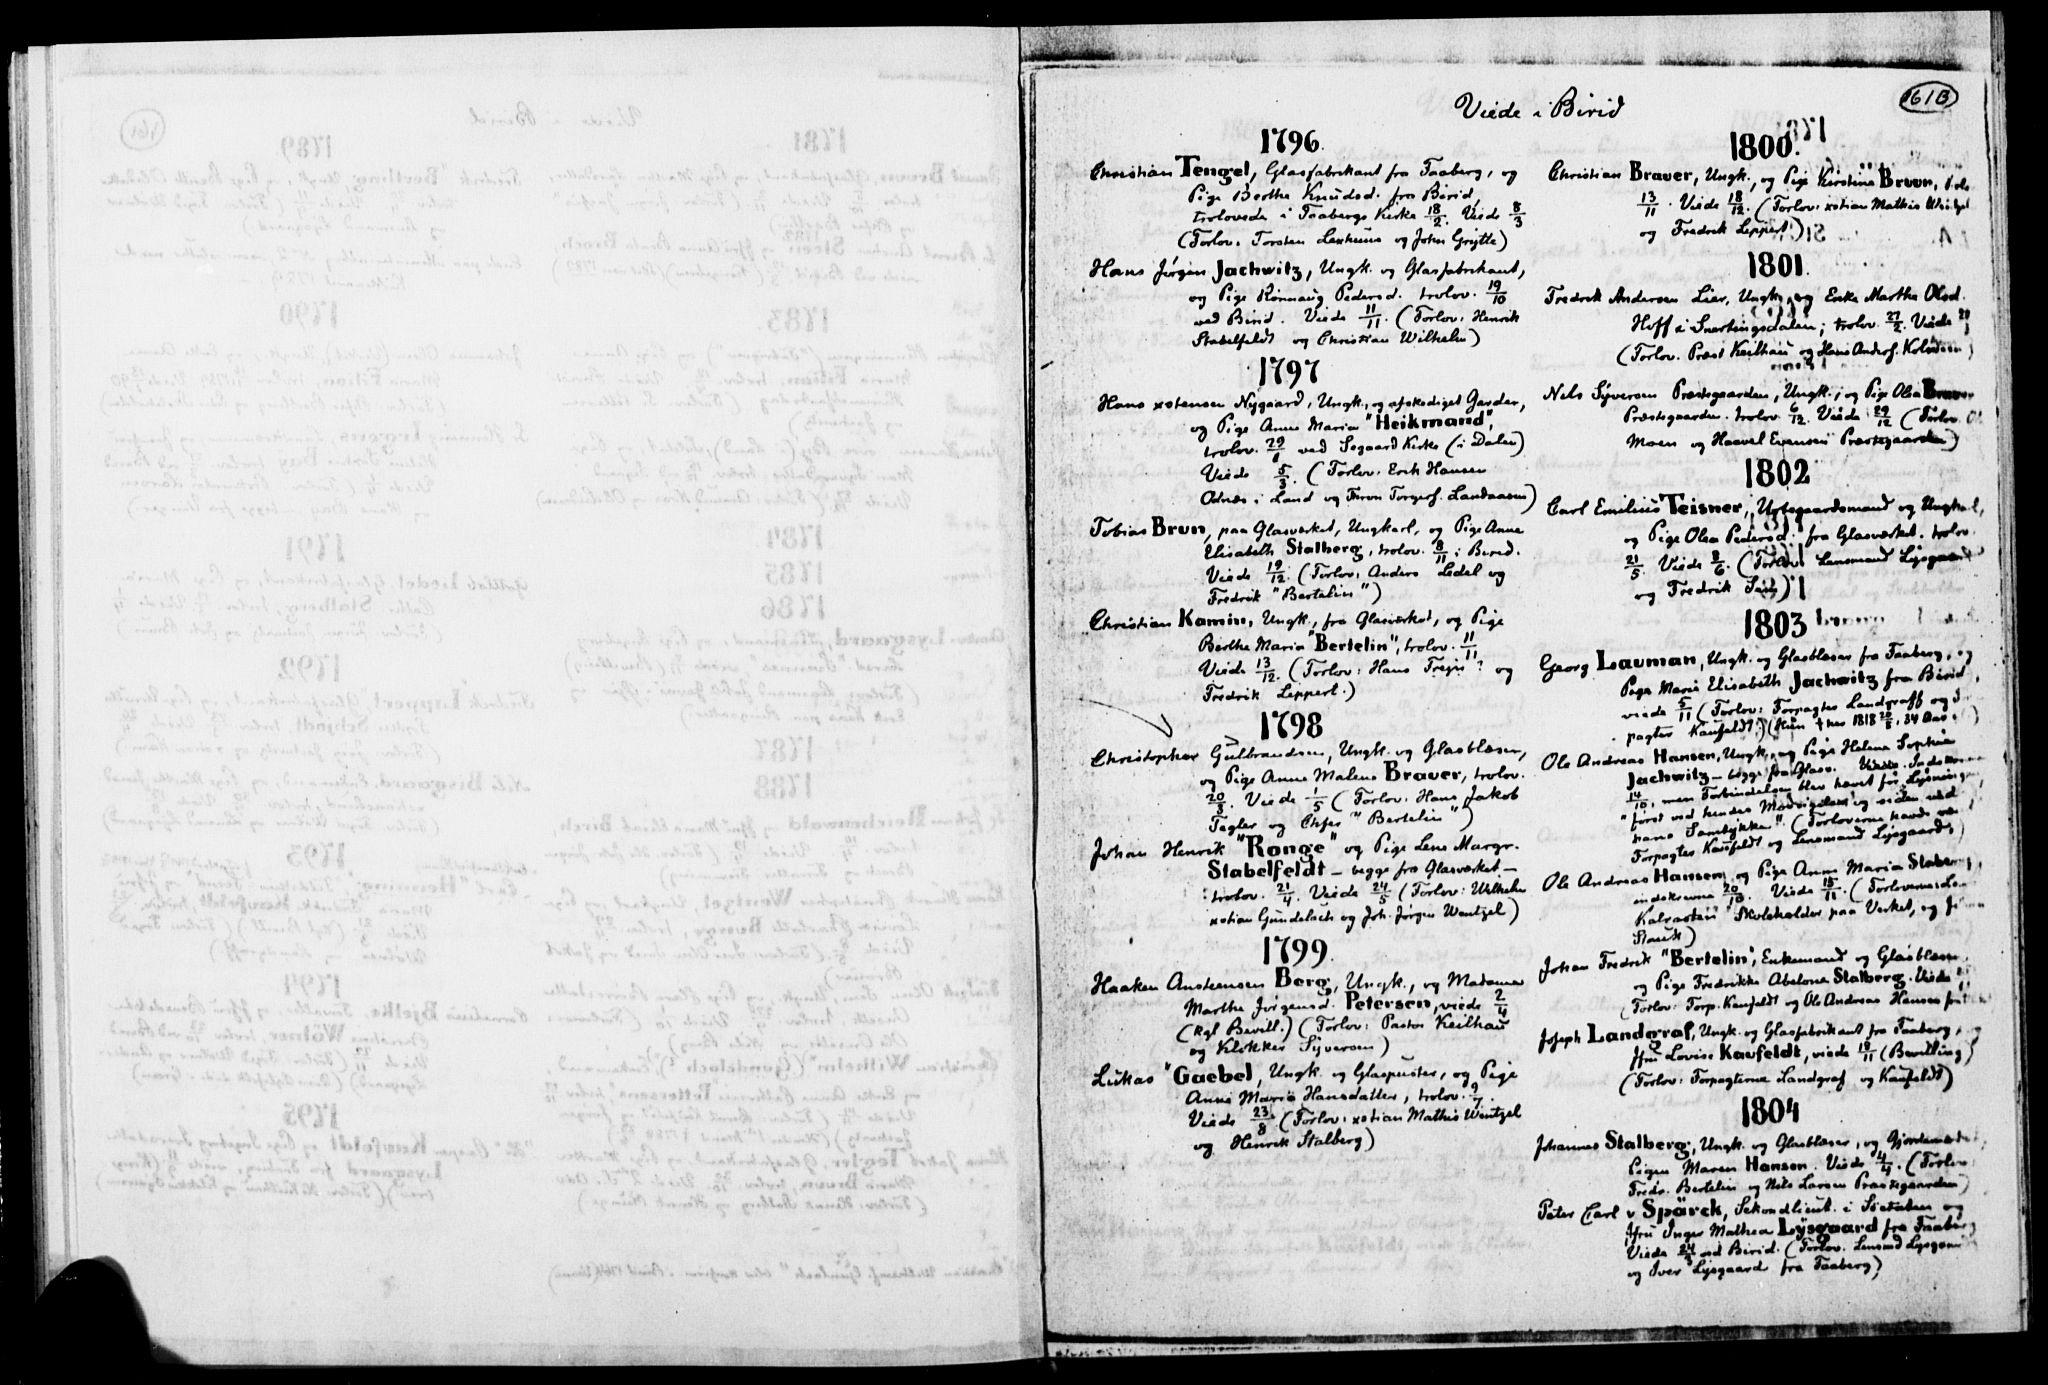 SAH, Biri prestekontor, Ministerialbok, 1730-1879, s. 161b